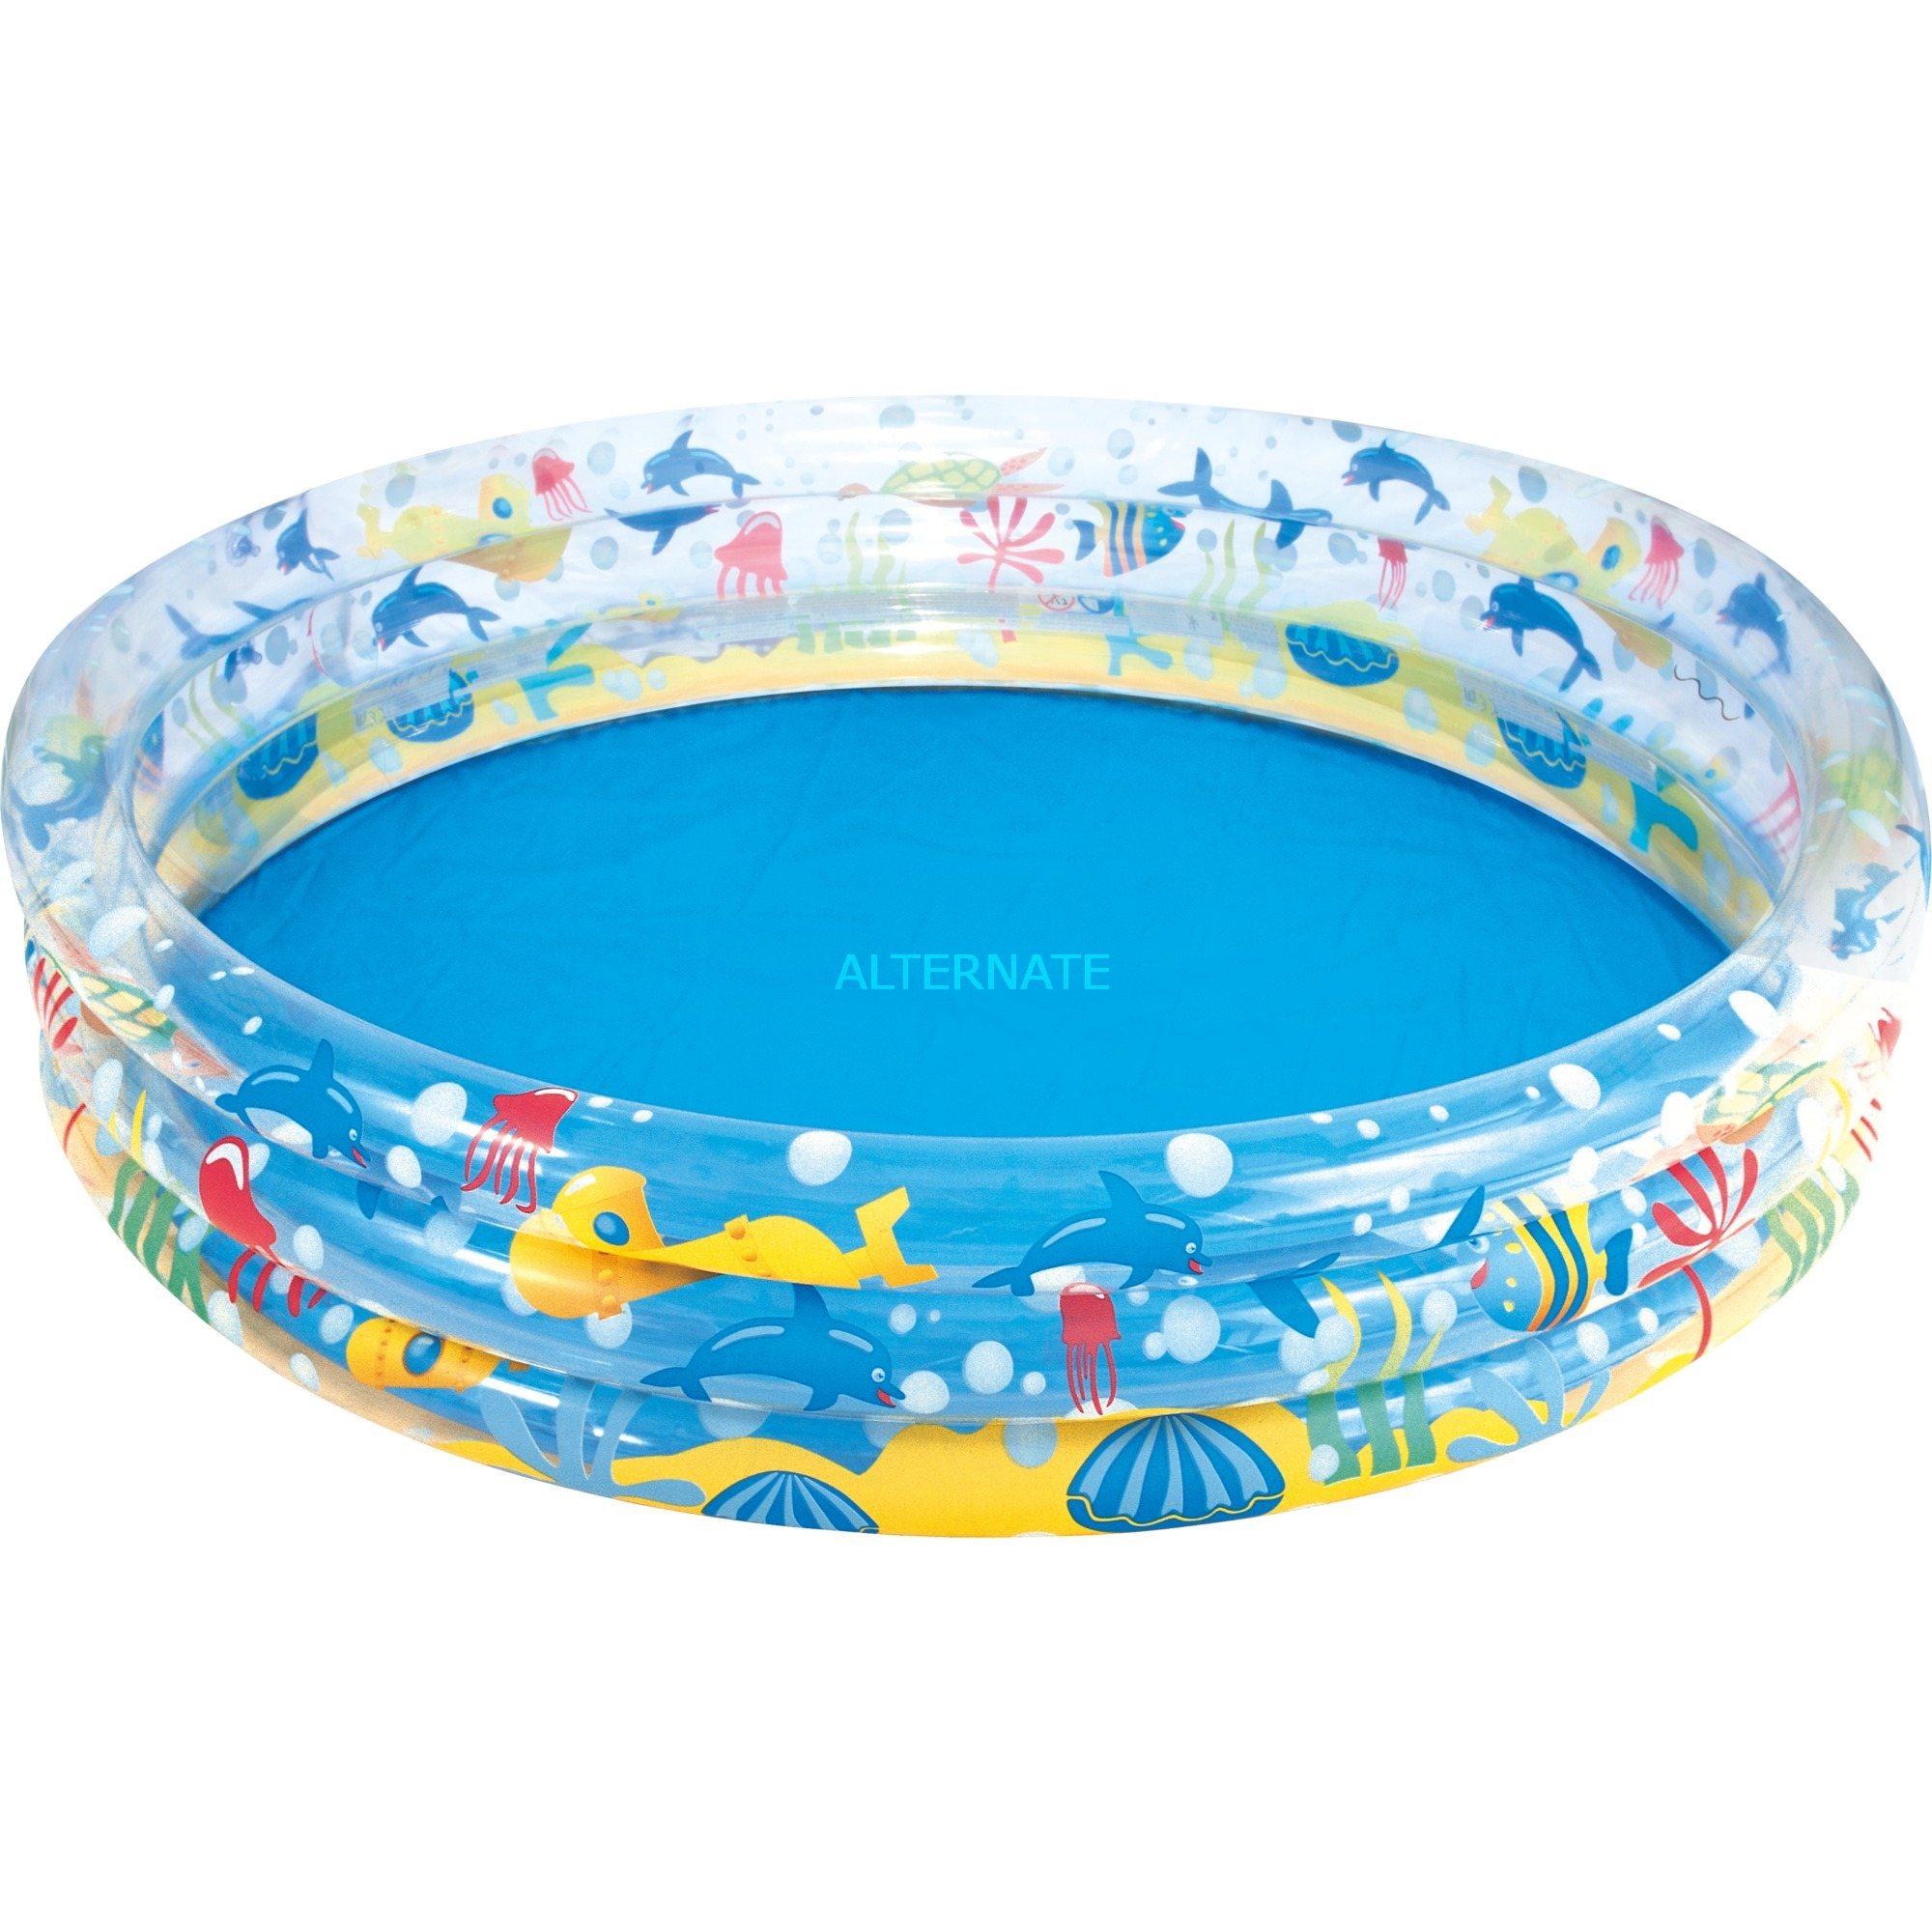 51004-282l-vinyl-legebassin-til-born-swimming-pool